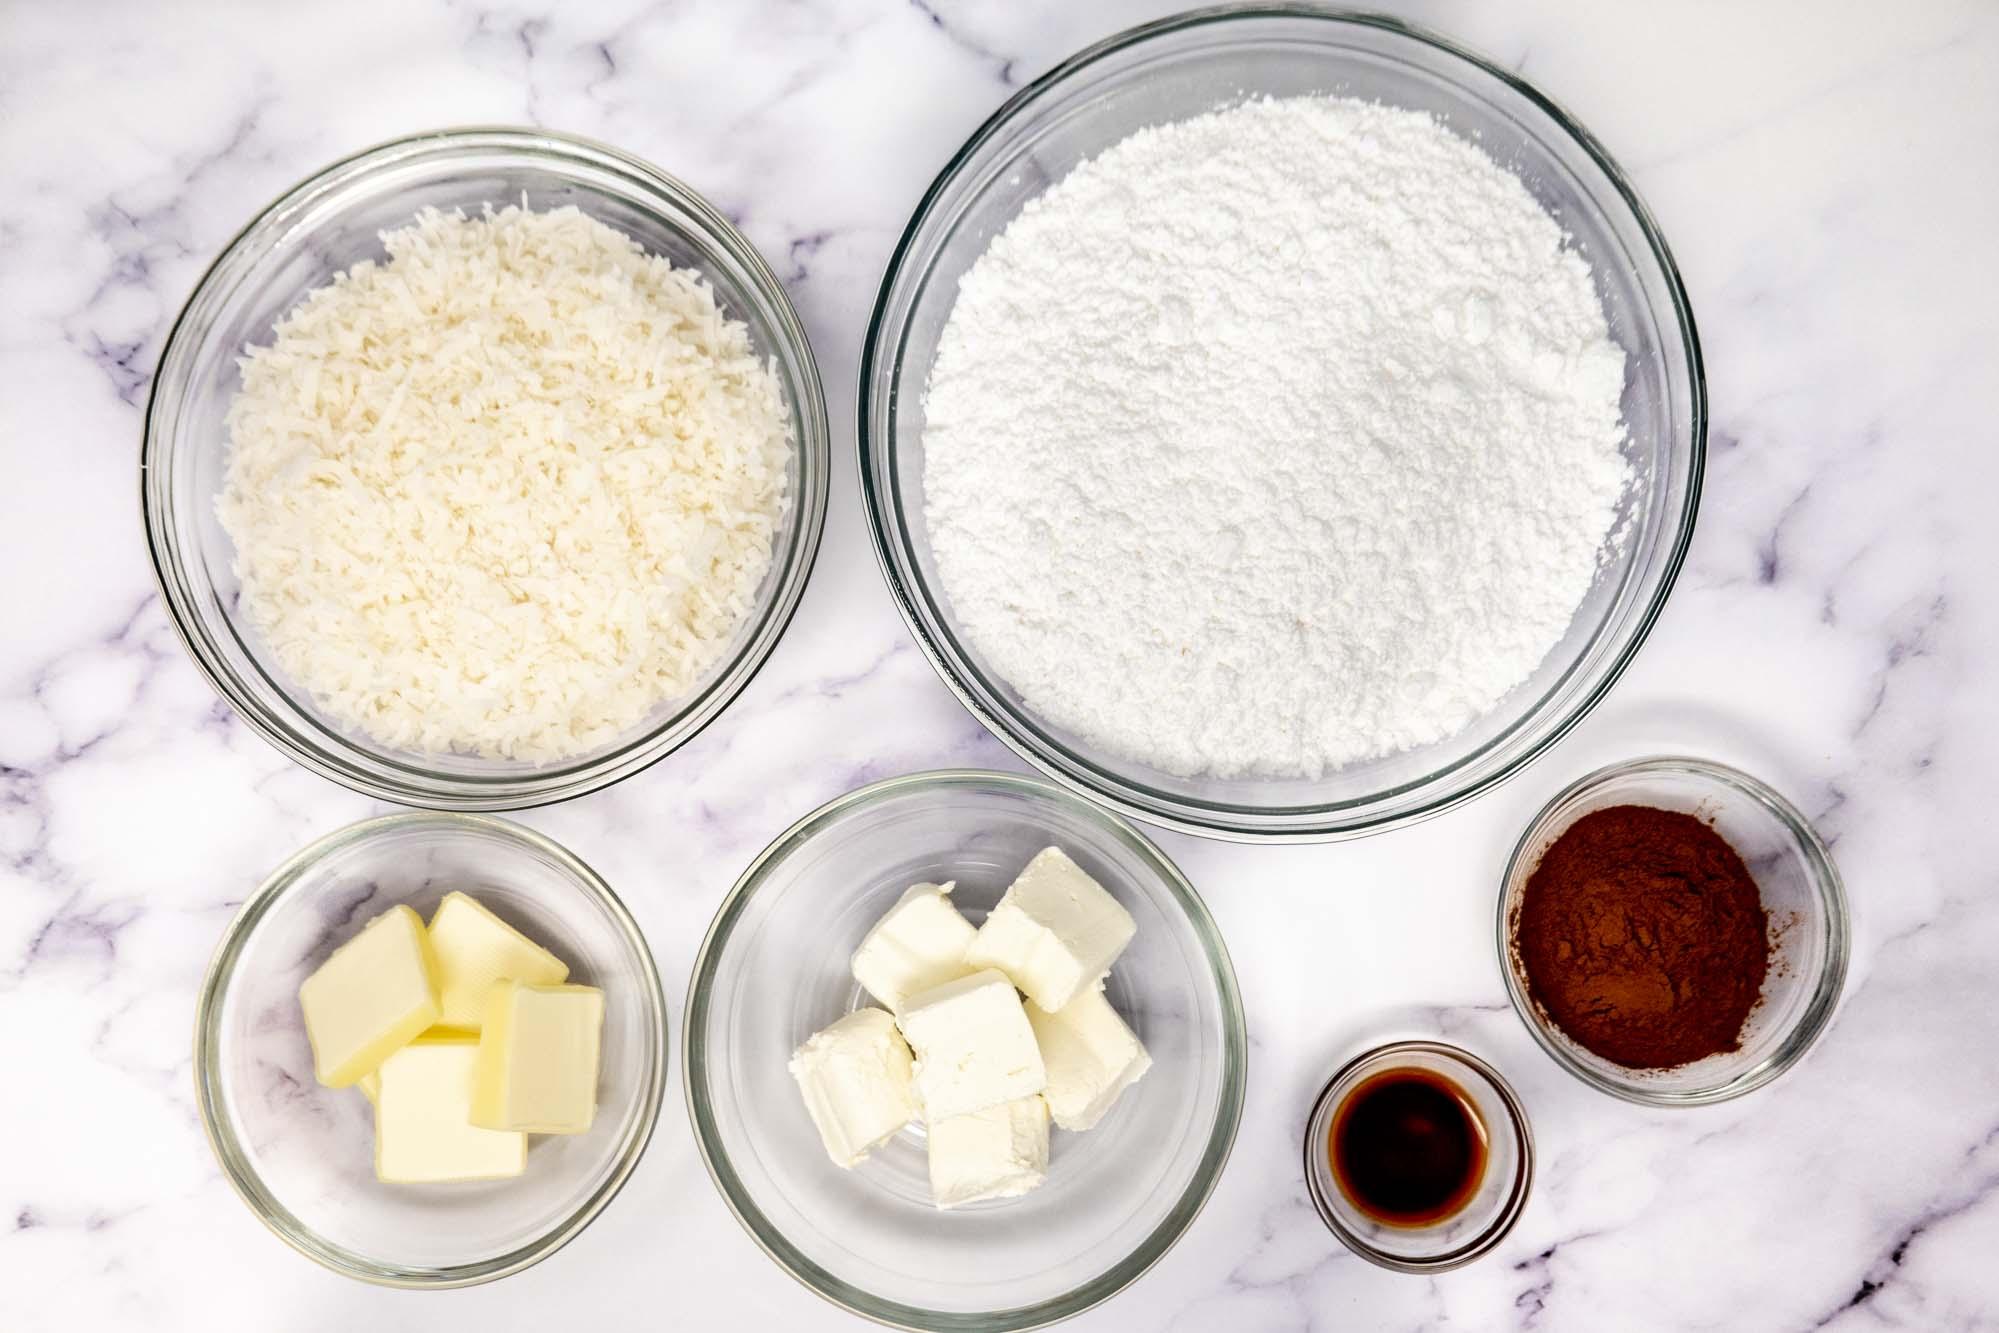 Bowls of shredded coconut, powdered sugar, butter, cream cheese, vanilla, and cinnamon